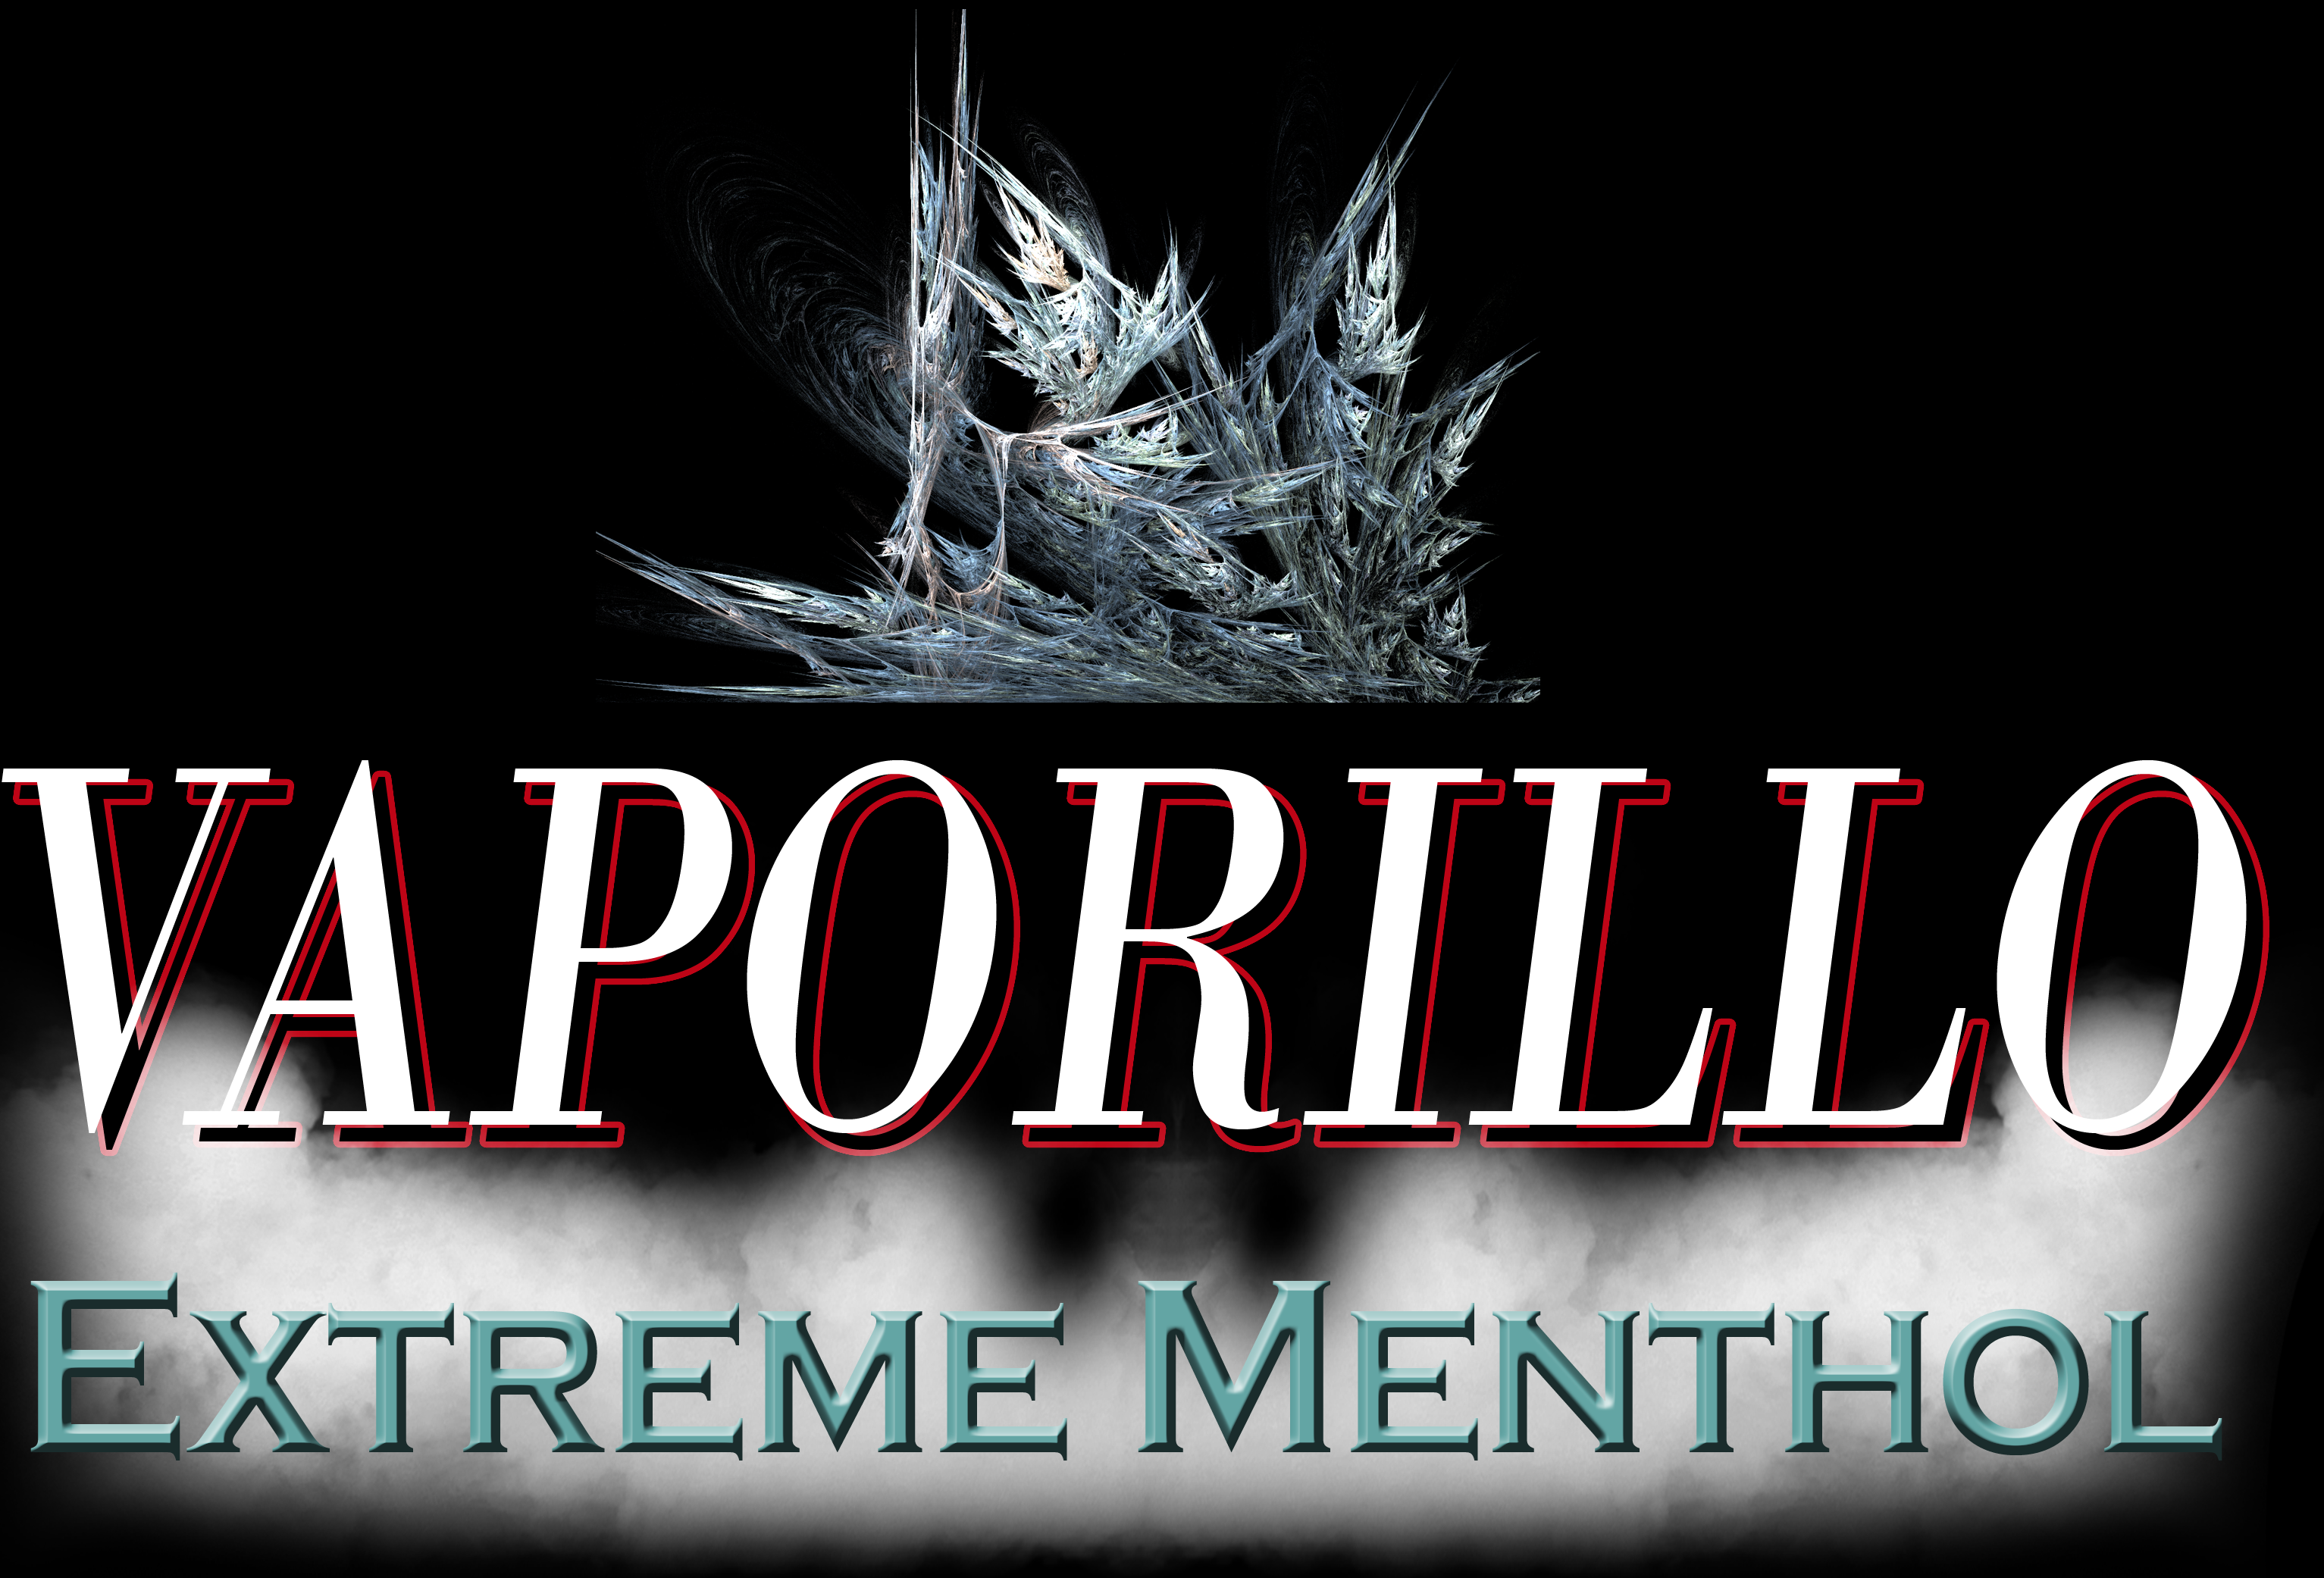 Extreme Mentrol 0mg